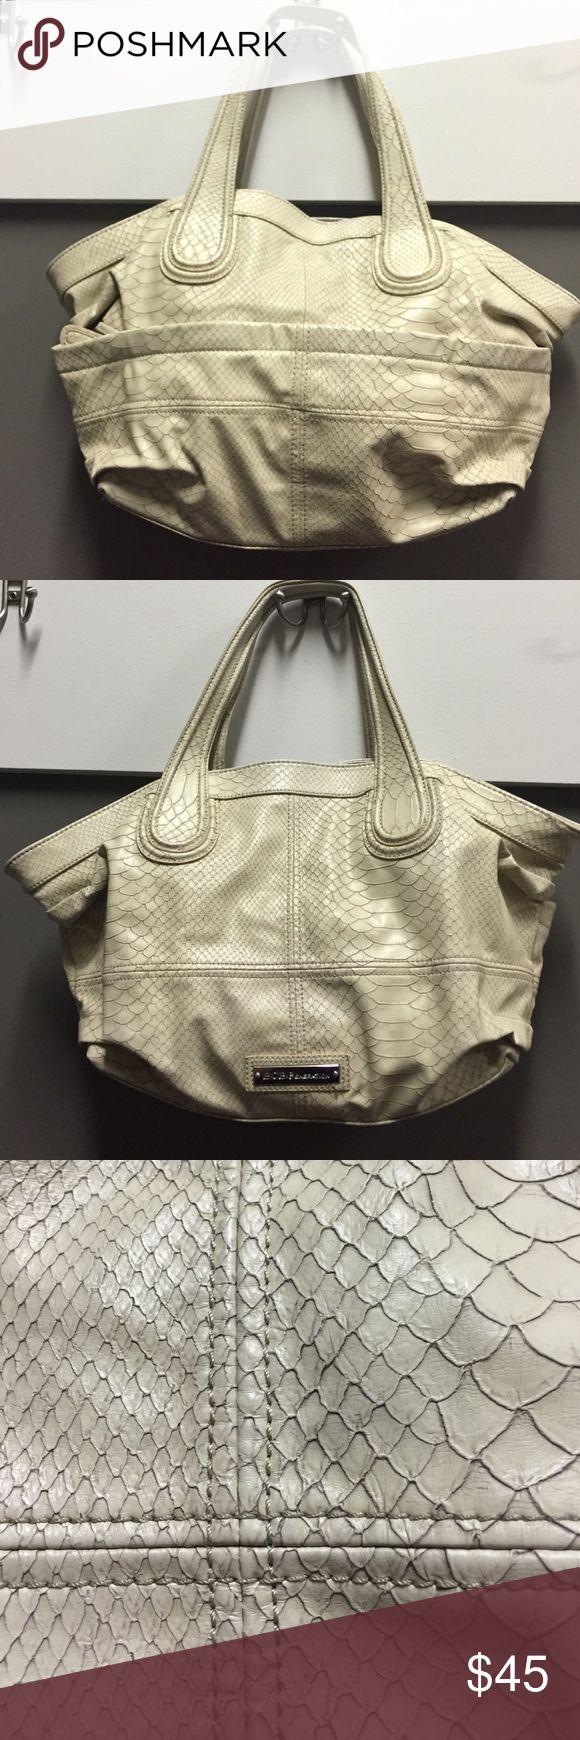 BCBGENERATION Cream Snake Print Handbag Great condition large bogo bag with on trend snake print. Large capacity bag. BCBGeneration Bags Hobos